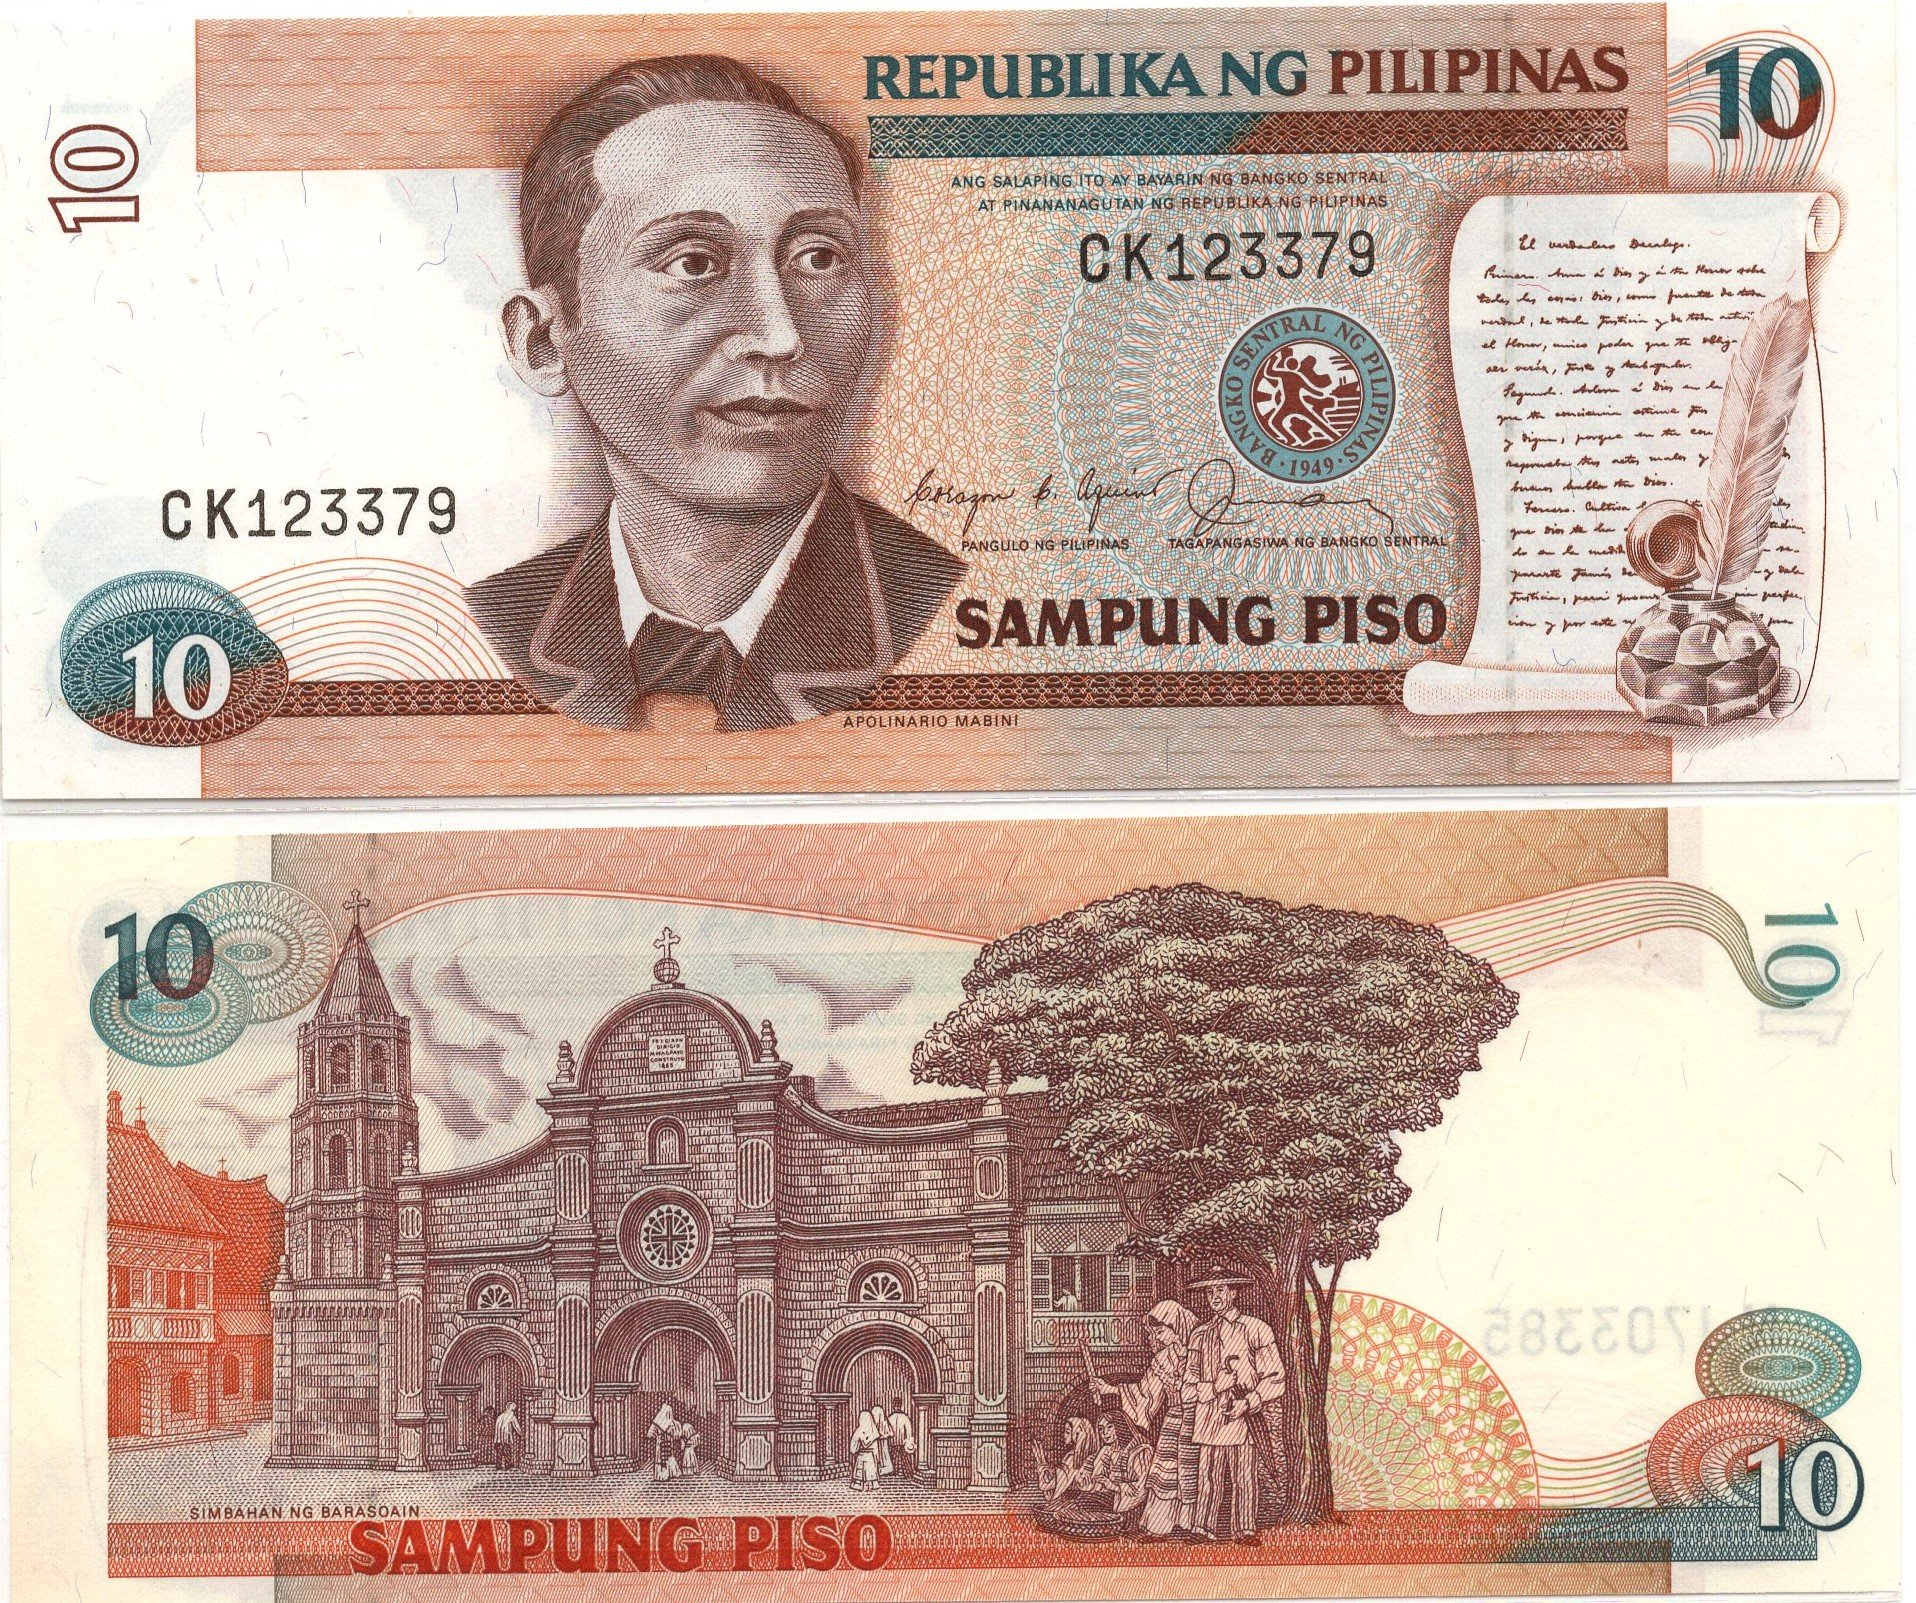 Philipines 10 pesos 1985